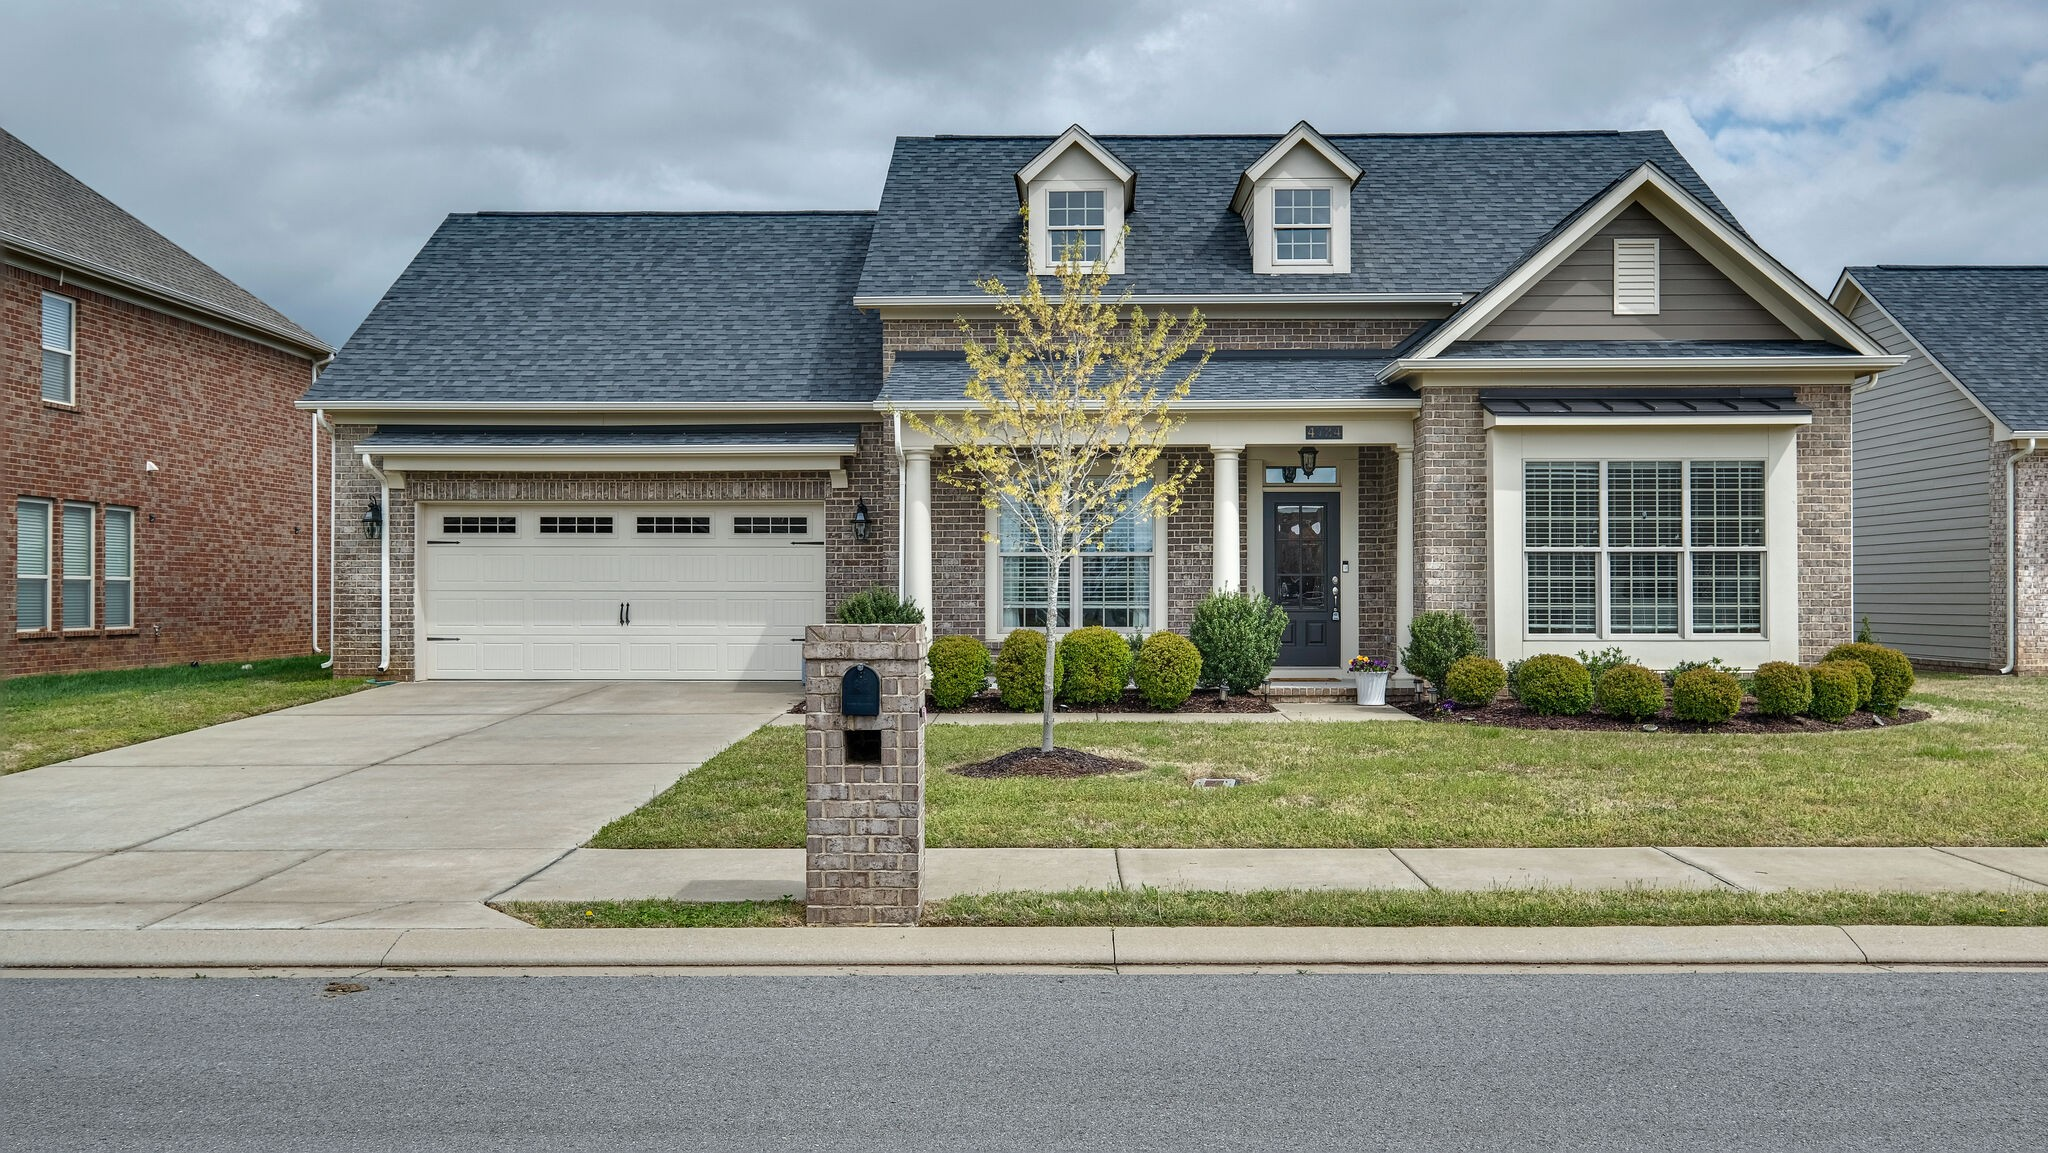 4724 Kingdom Dr Property Photo - Murfreesboro, TN real estate listing